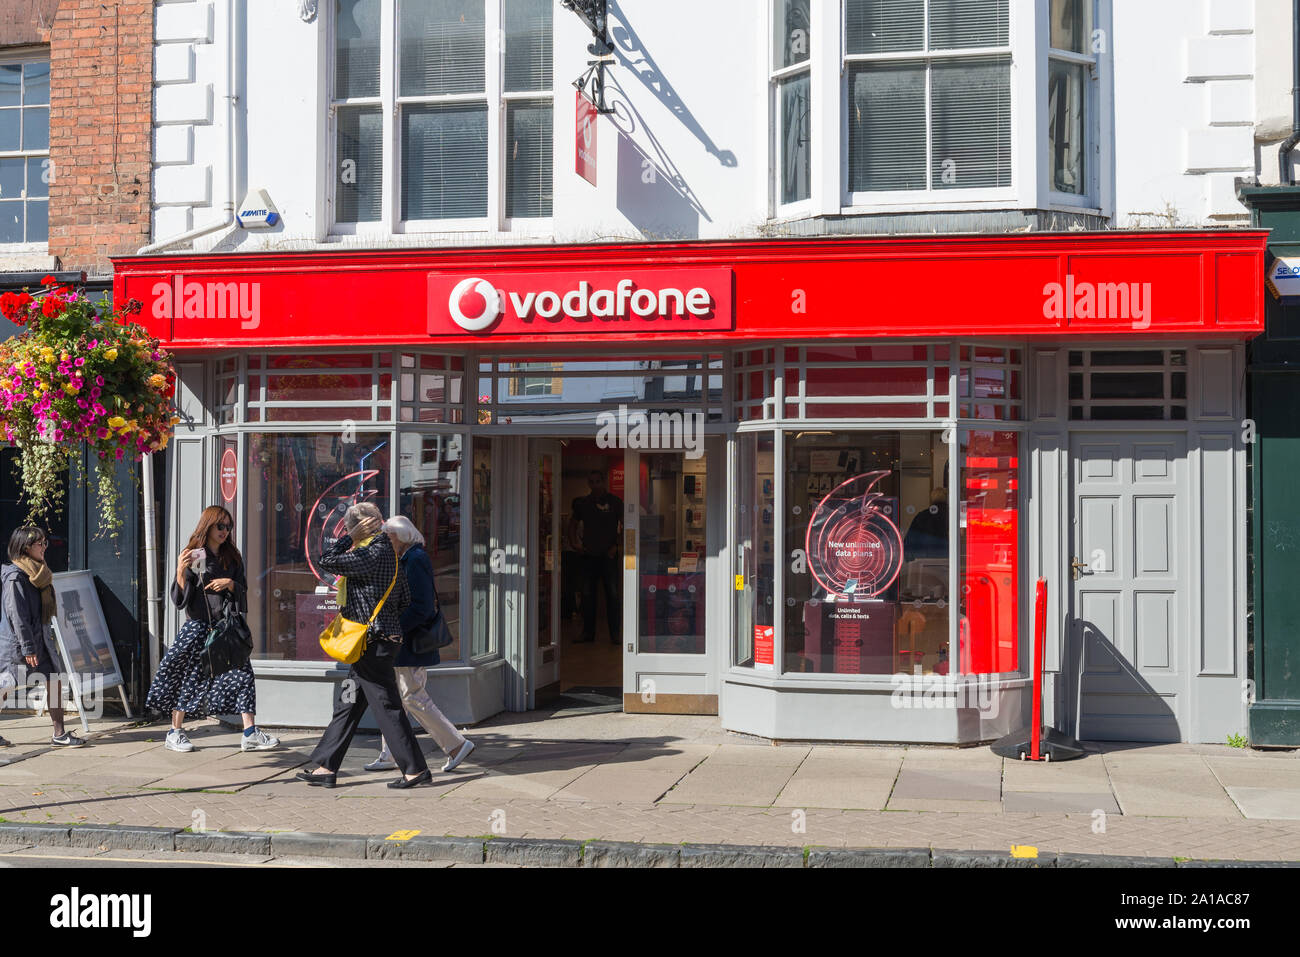 T mobile shop karlsruhe